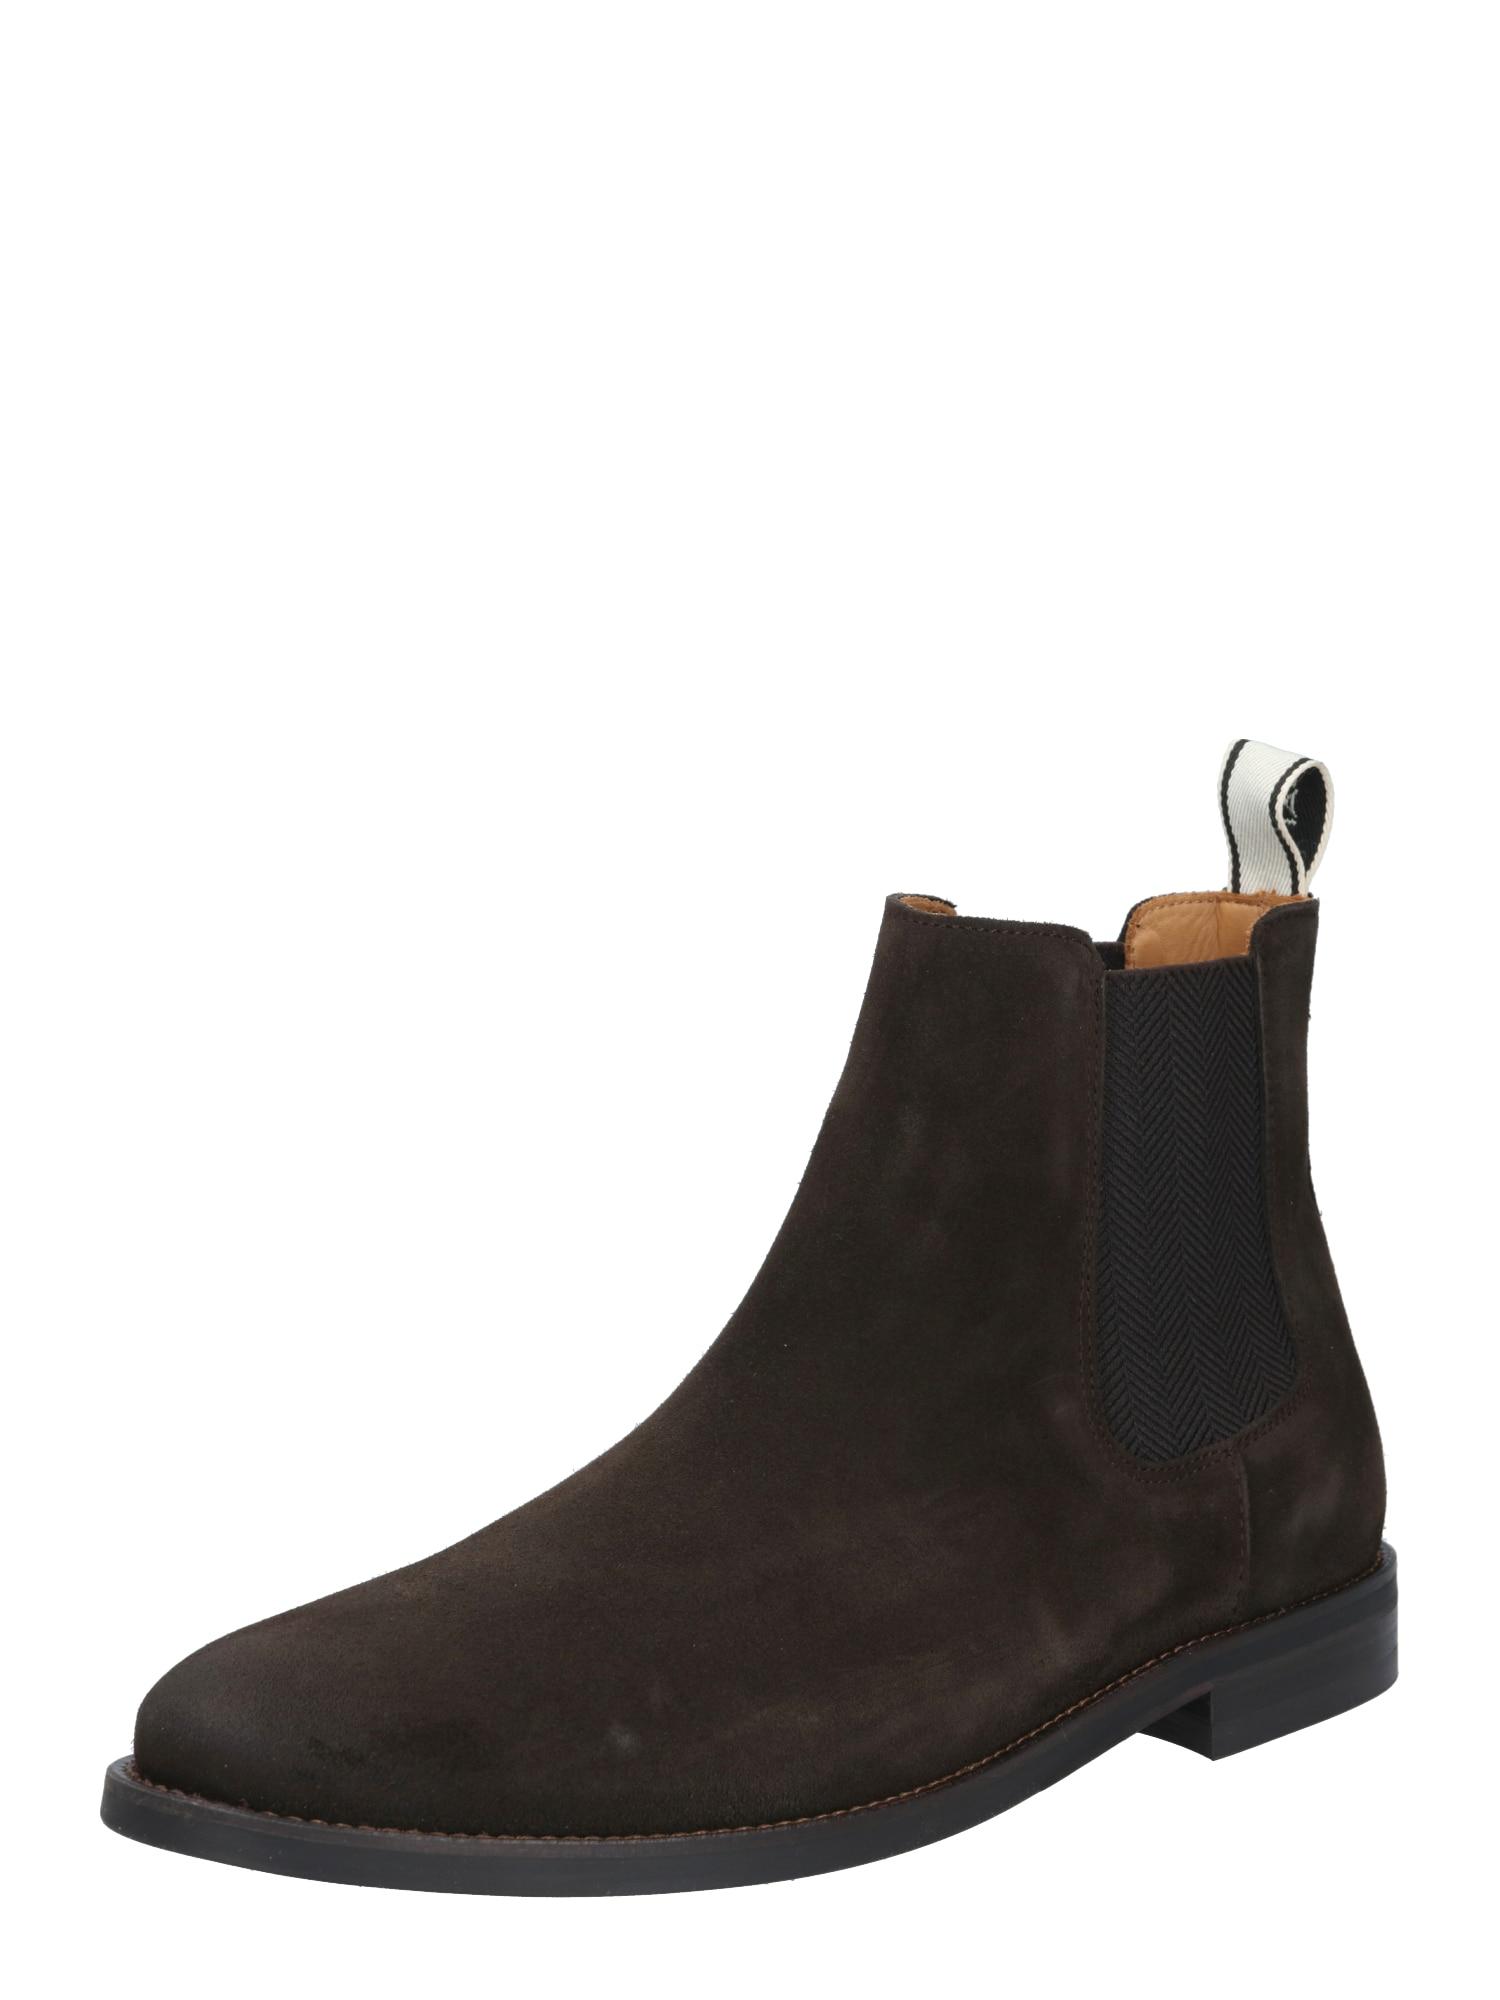 "GANT ""Chelsea"" batai tamsiai ruda"